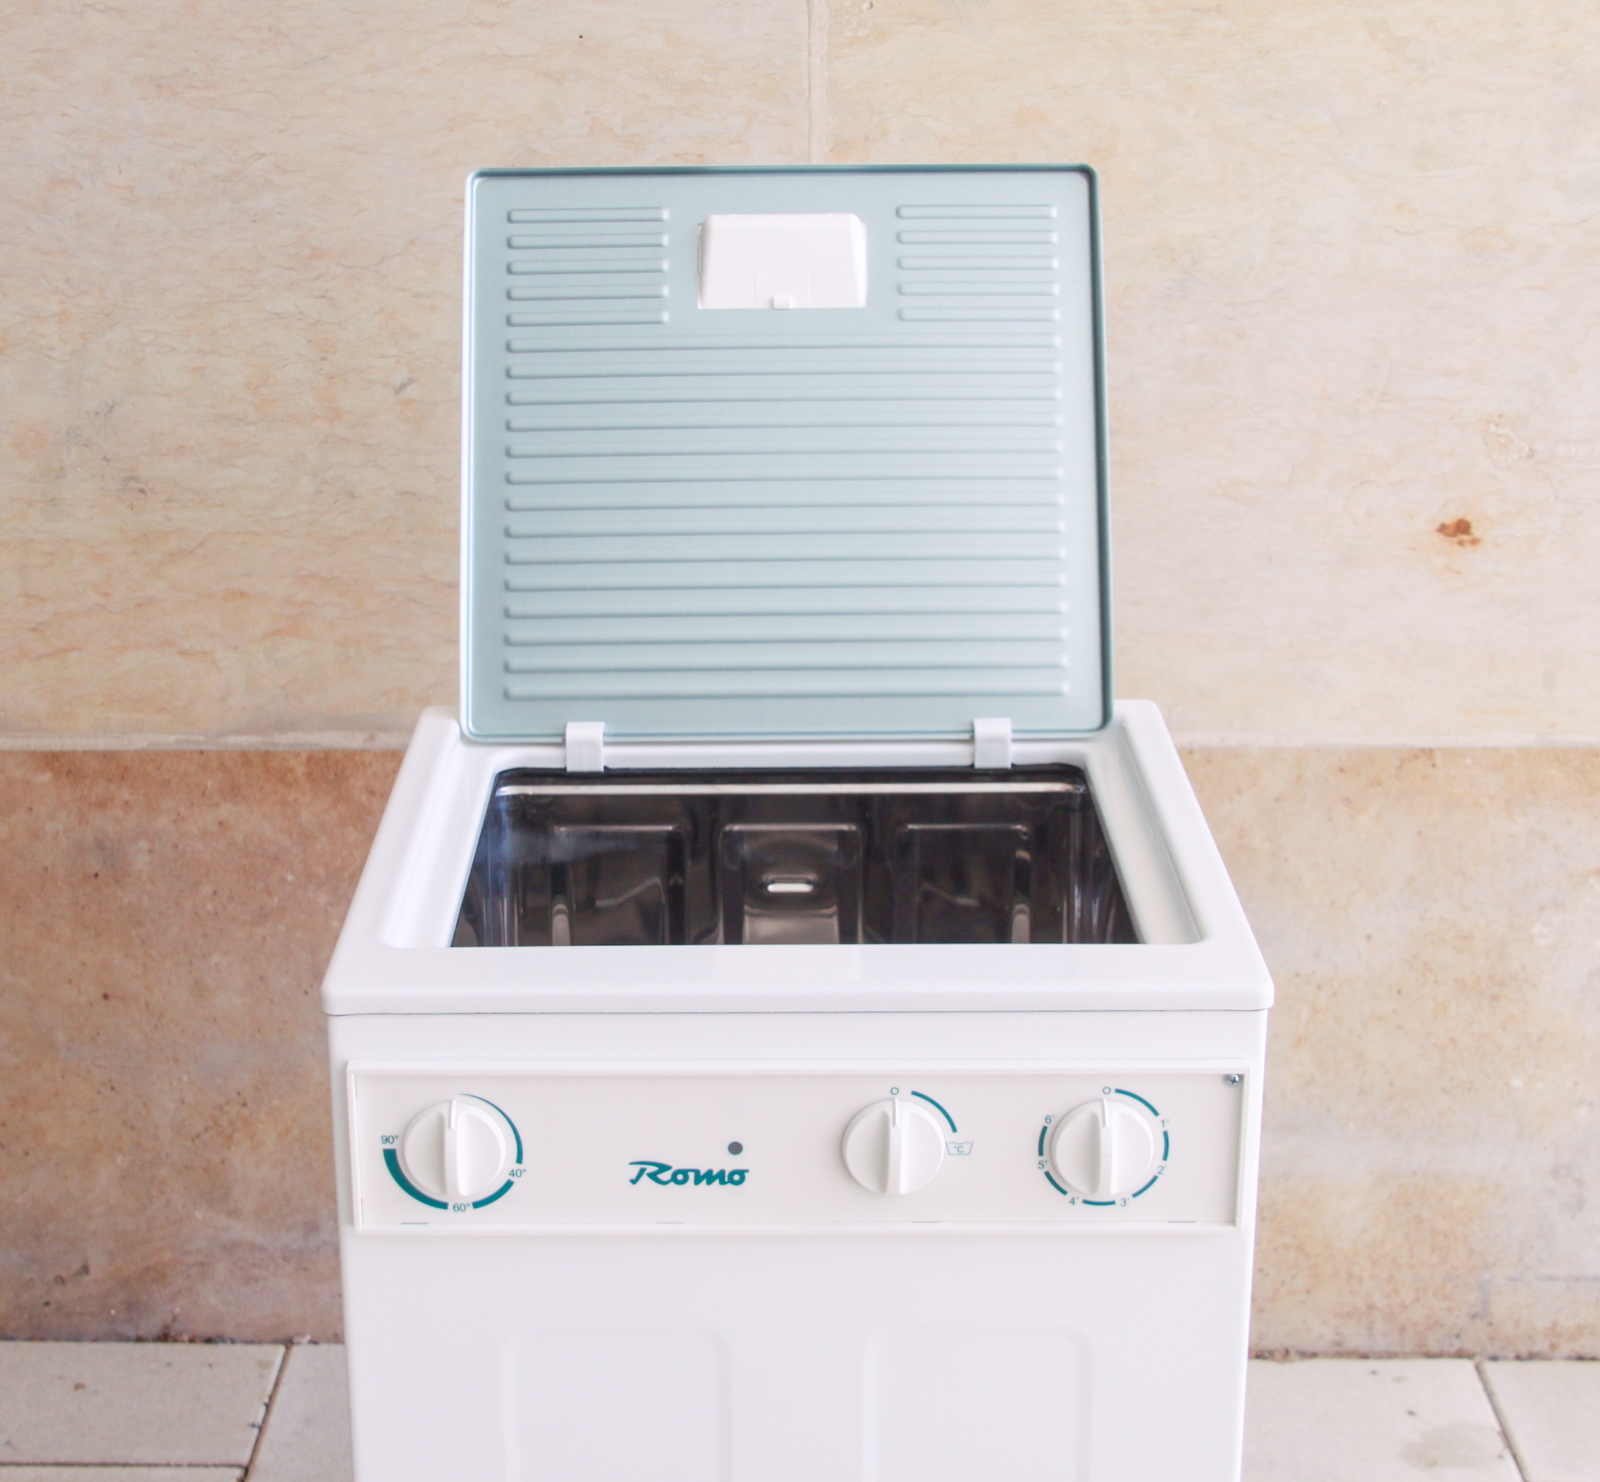 romo r 190 1 welenrad waschmaschine camping garten ohne. Black Bedroom Furniture Sets. Home Design Ideas